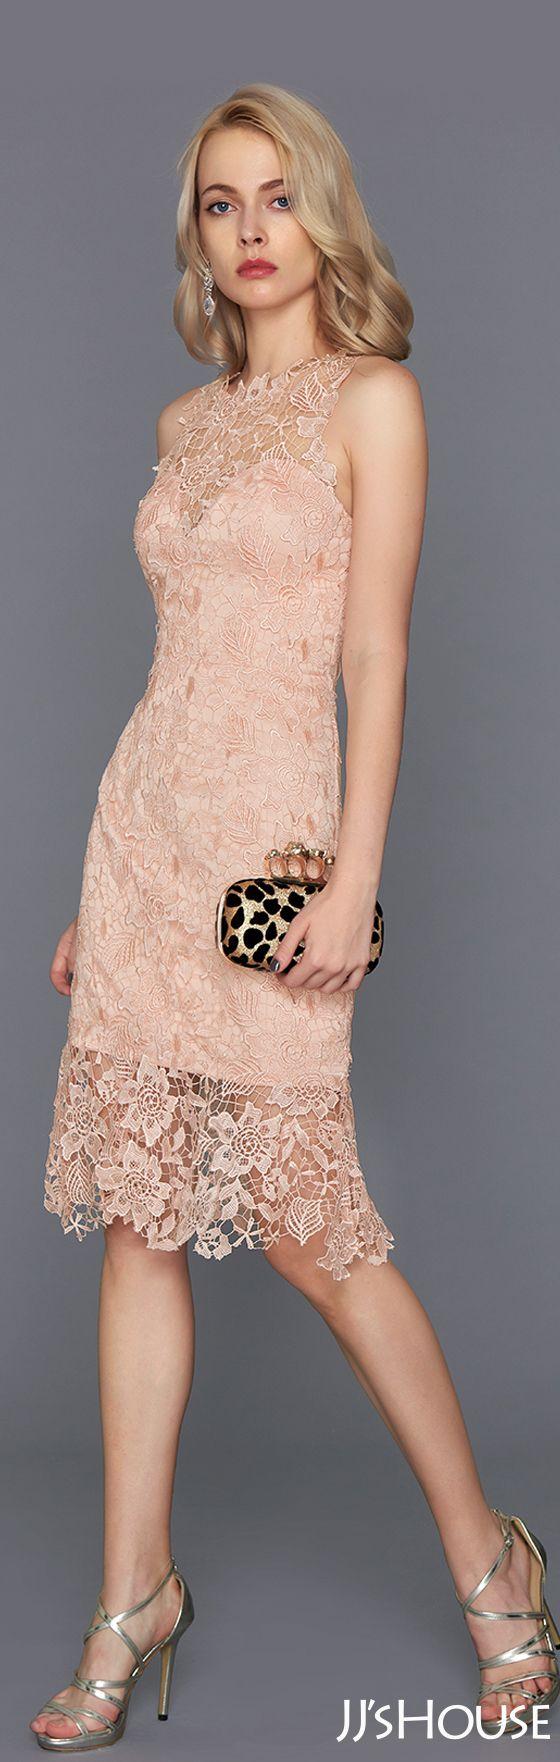 848 best JJsHouse Party Dresses -Evening/Cocktail images on Pinterest